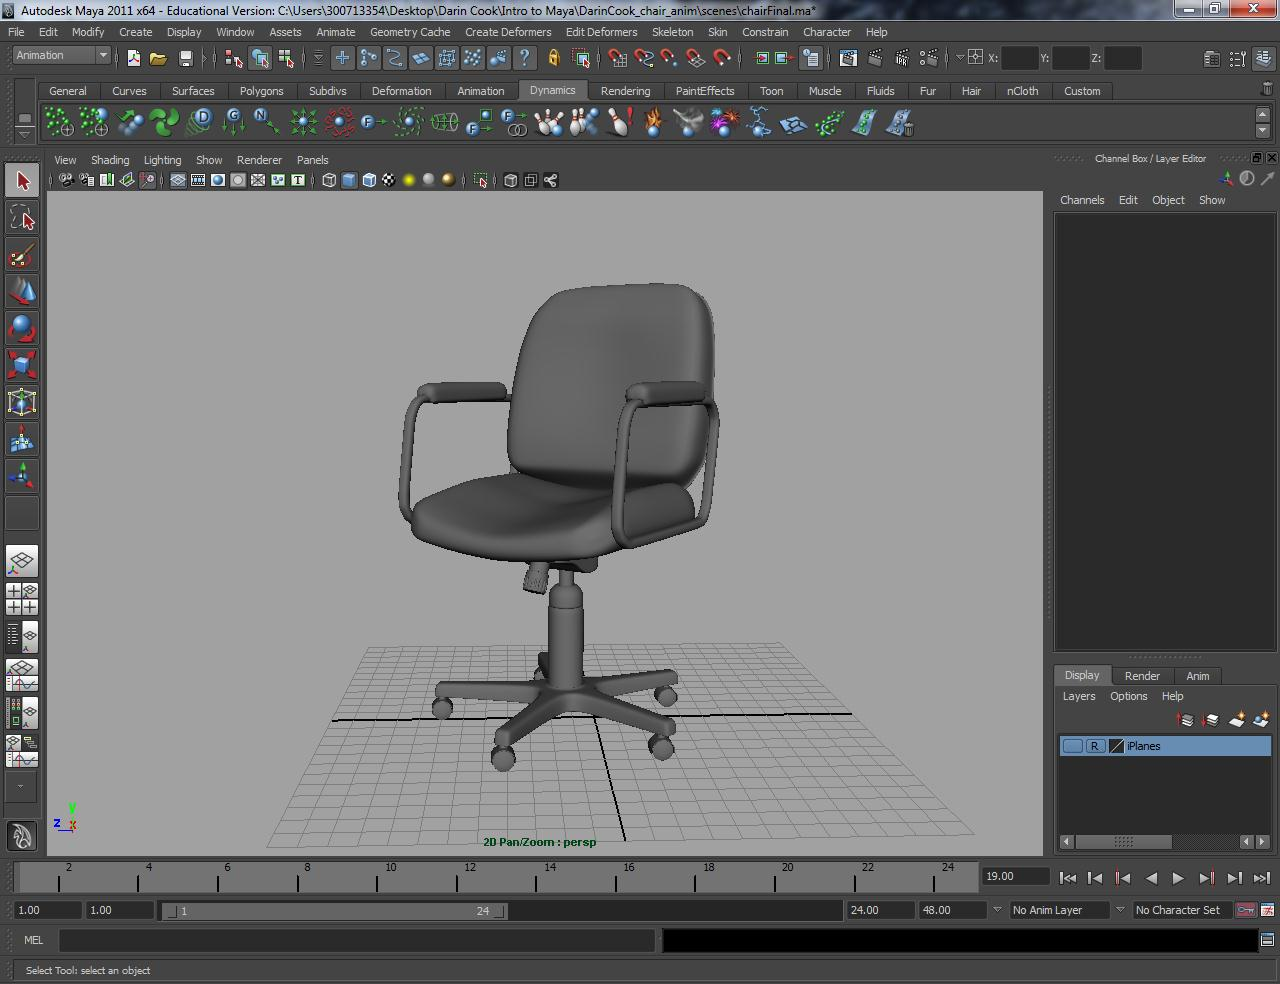 Darin 39 s animation blog office chair model in maya my for Chair 3d model maya